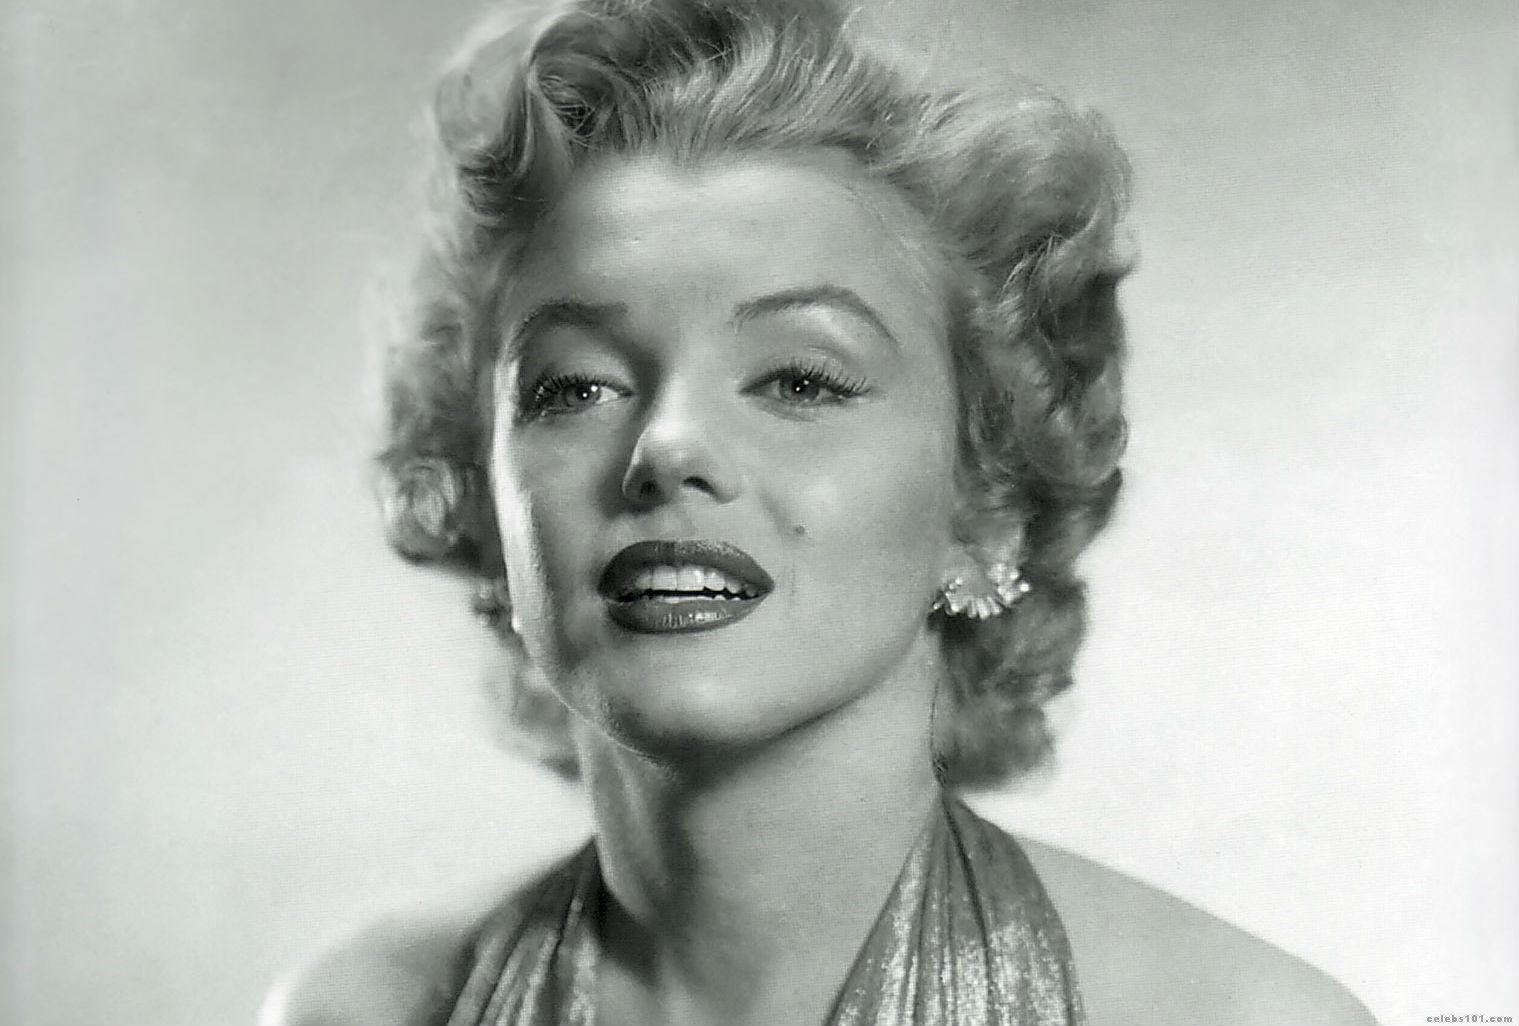 Marilyn monroe wallpapers 1519x1026 actresses wallpaper download at - Marilyn monroe wallpaper download ...